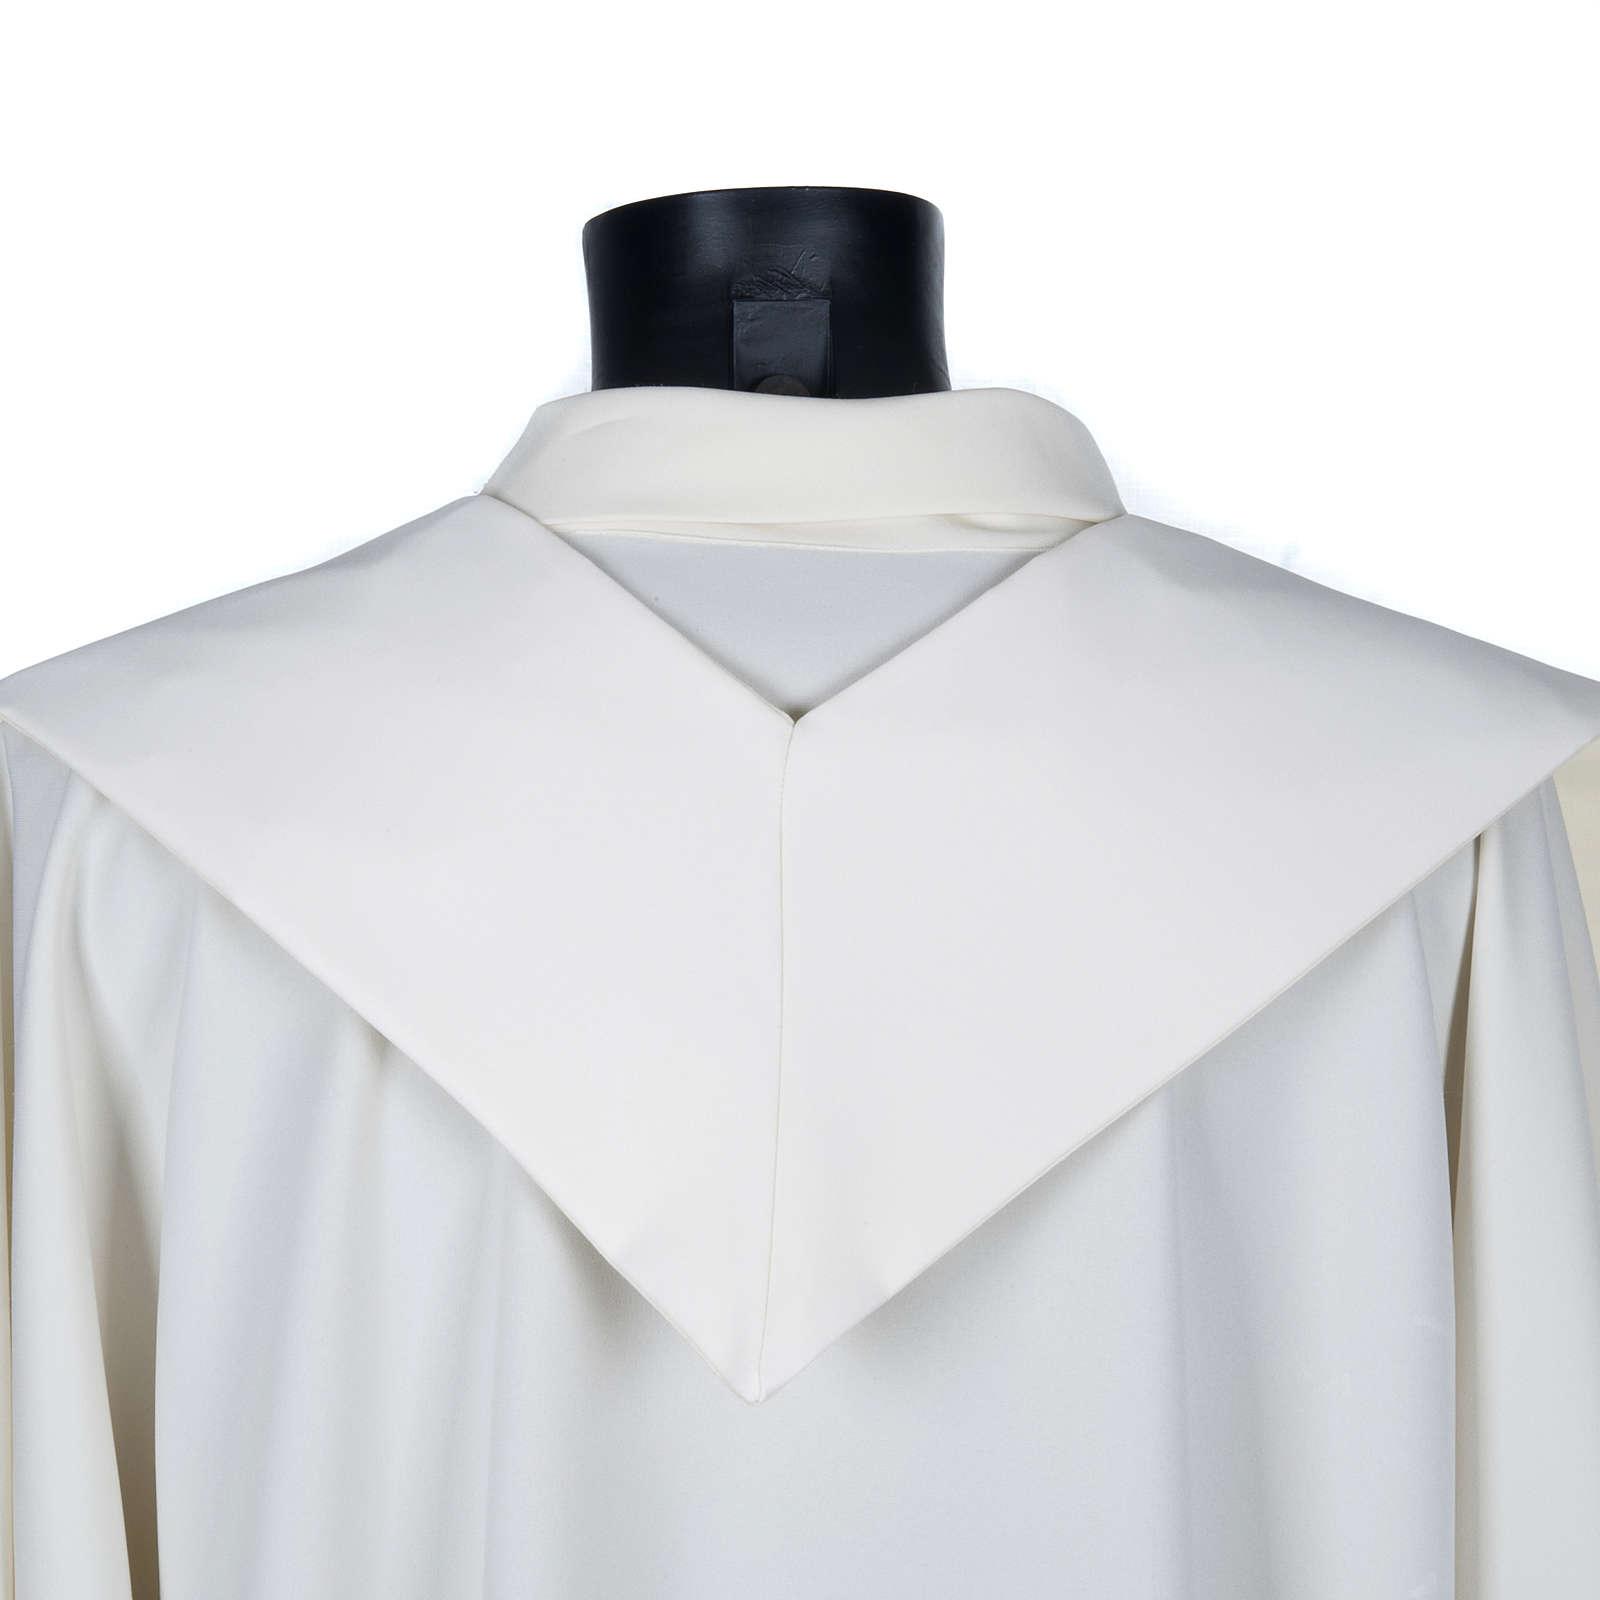 Stola sacerdotale ecrù croce dorata ricamata 4